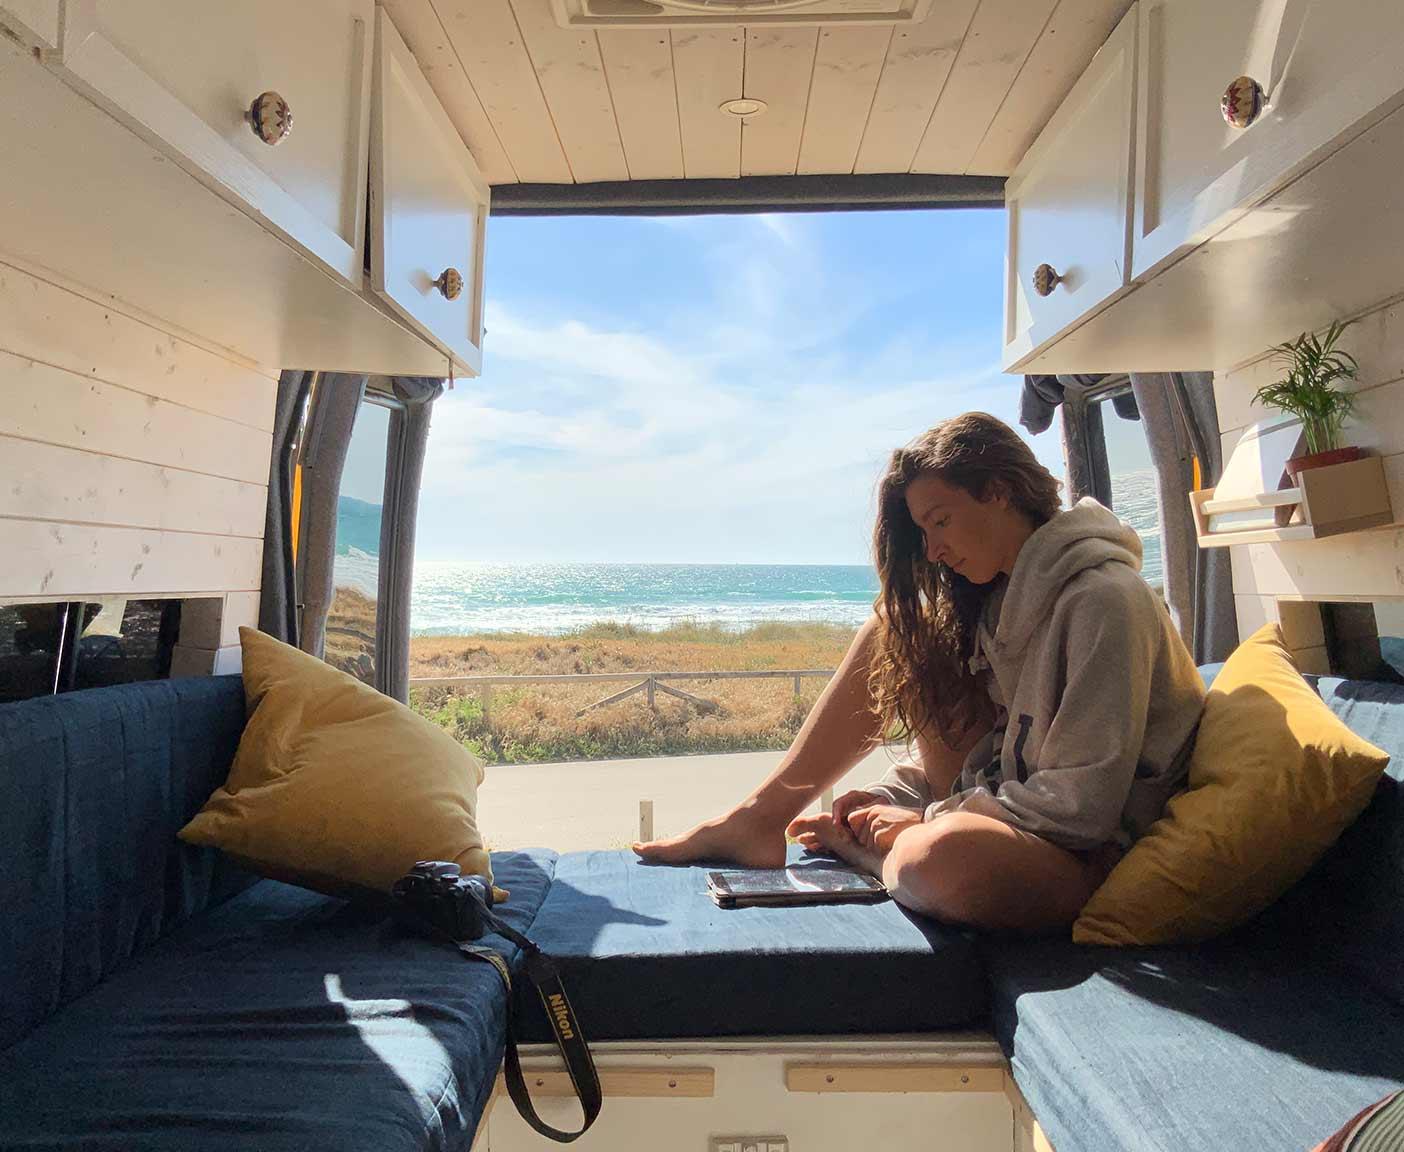 ldv-convoy-kaufen-wohnmobil-maxus-camper-ersatzteile-vanlife-beach